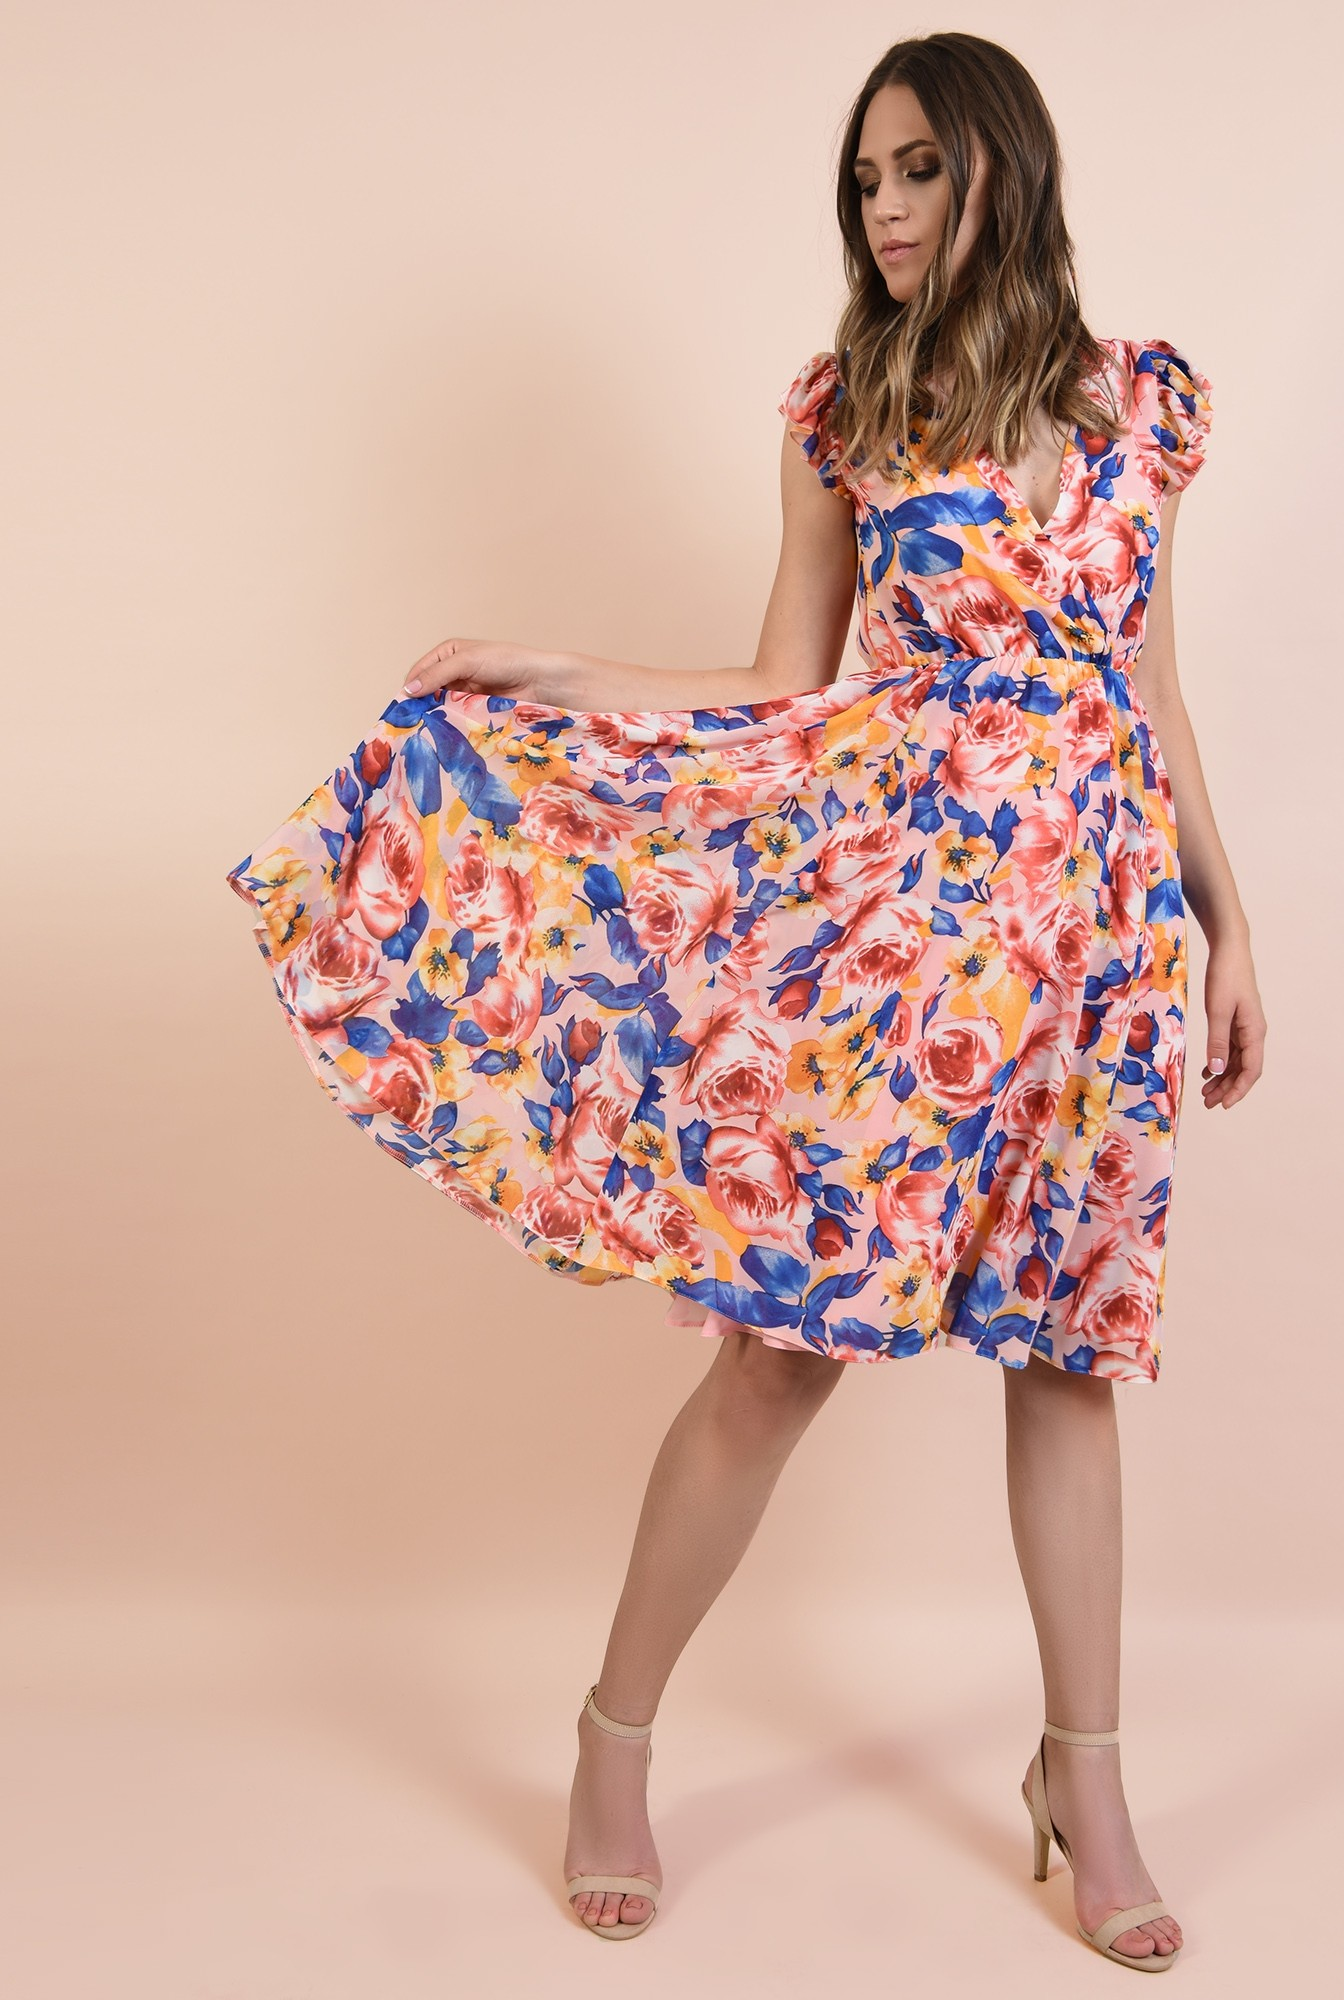 0 - rochie casual, evazata, midi, talie pe elastic, imprimeu floral, Poema